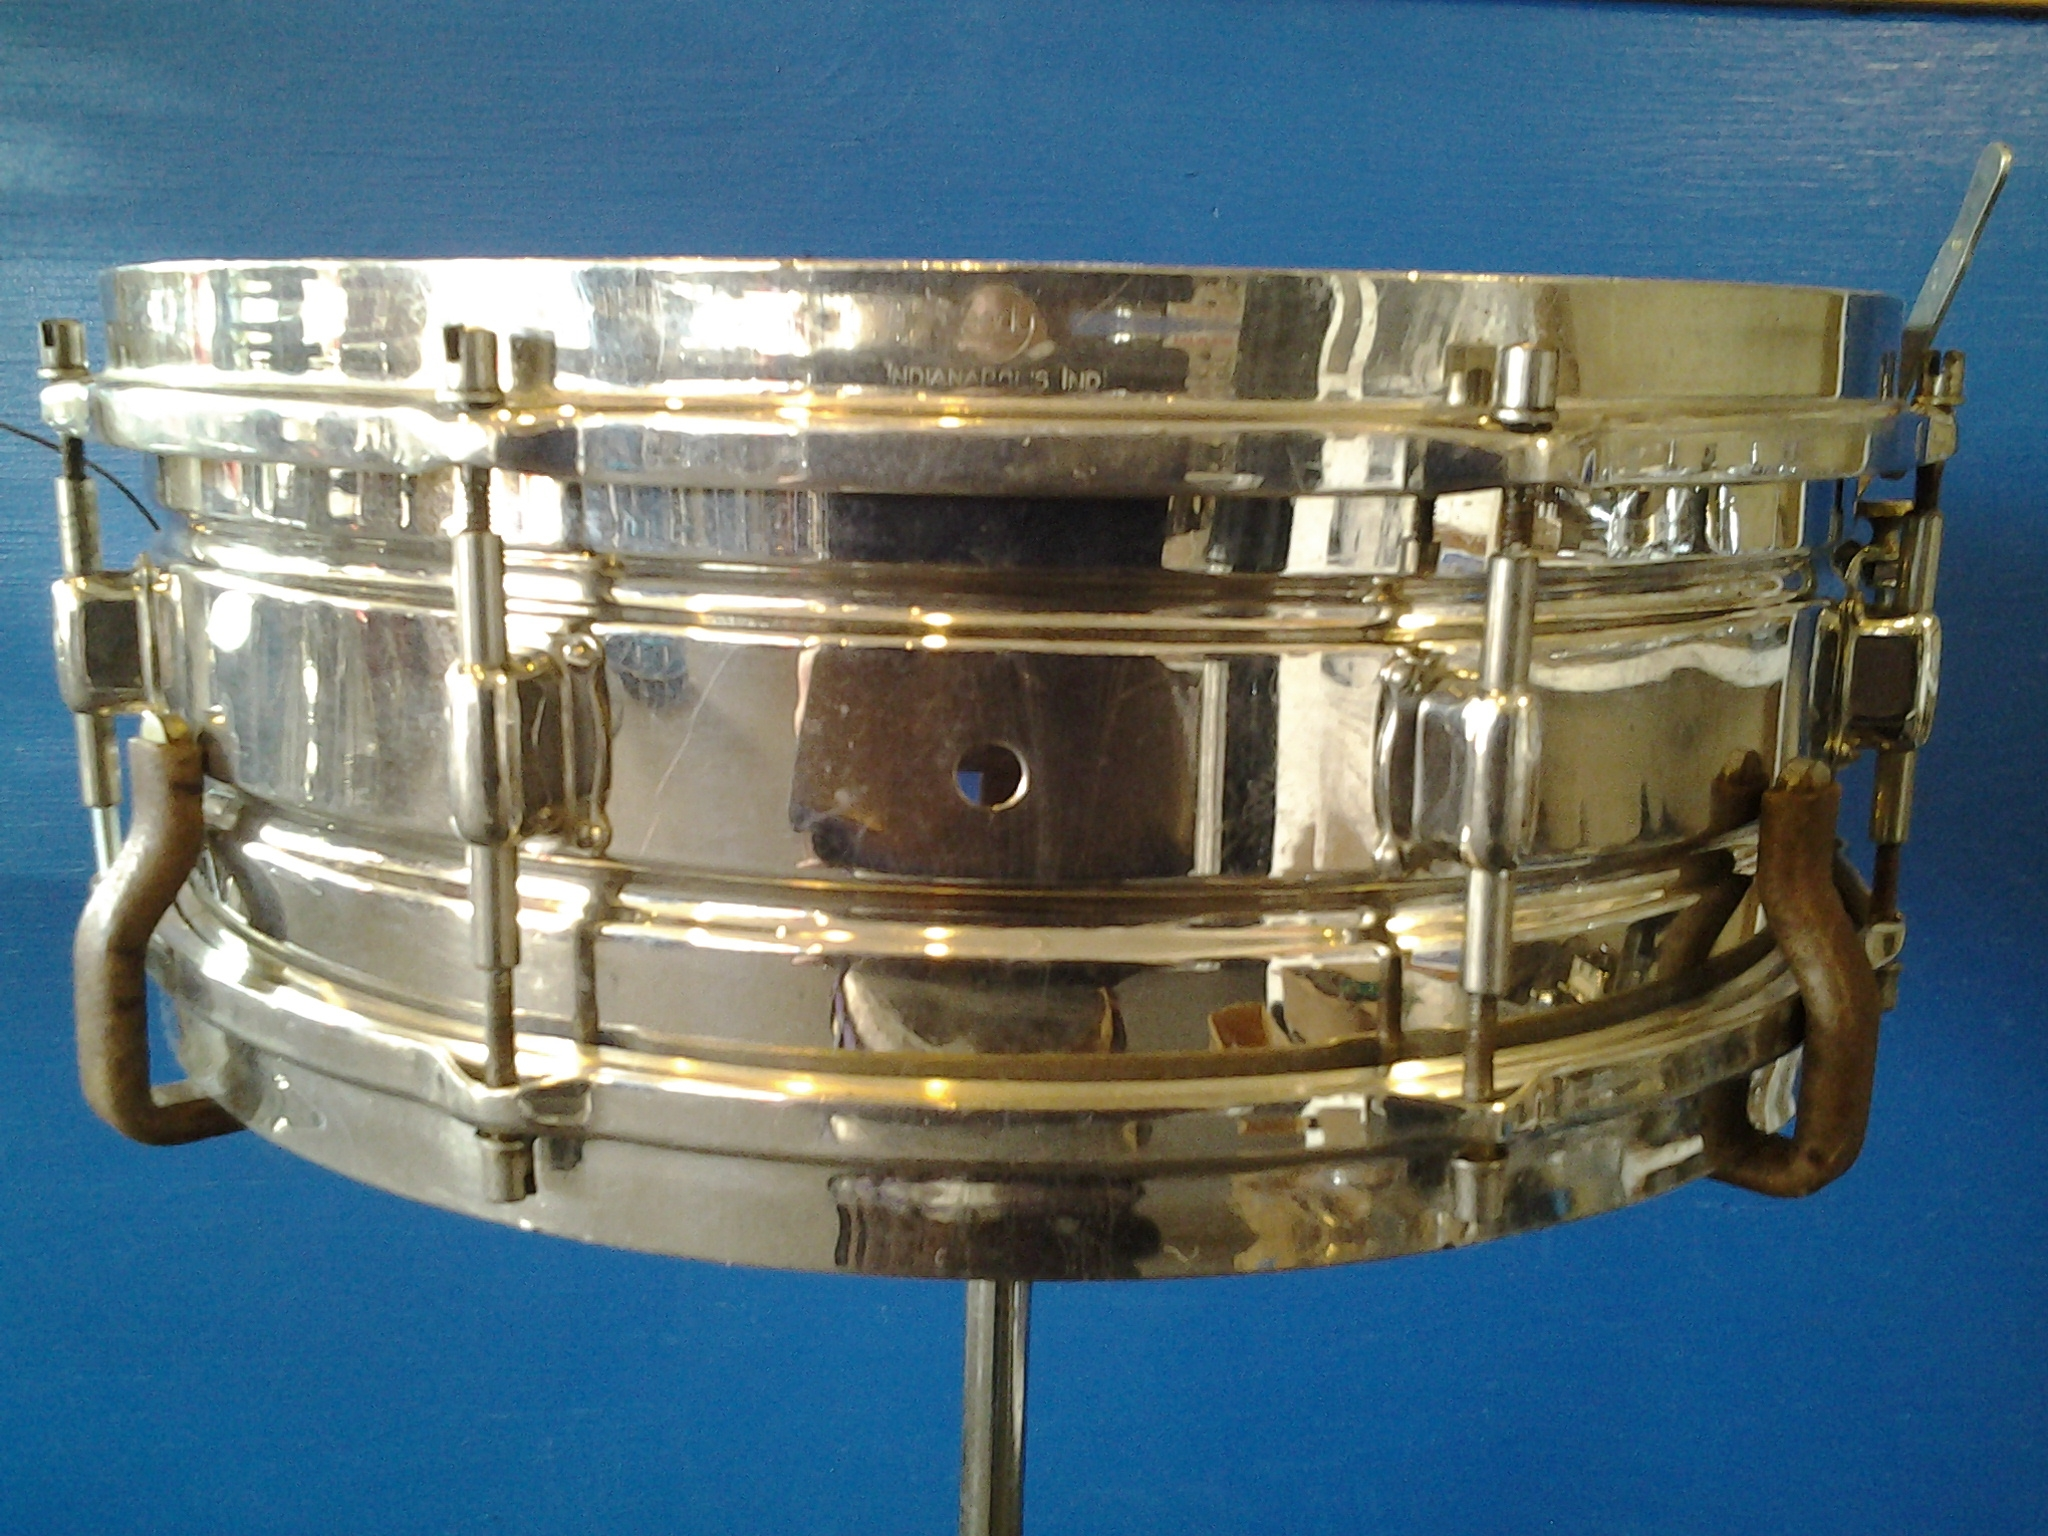 1920 39 s leedy multi model snare drum sam adato 39 s drum shop. Black Bedroom Furniture Sets. Home Design Ideas